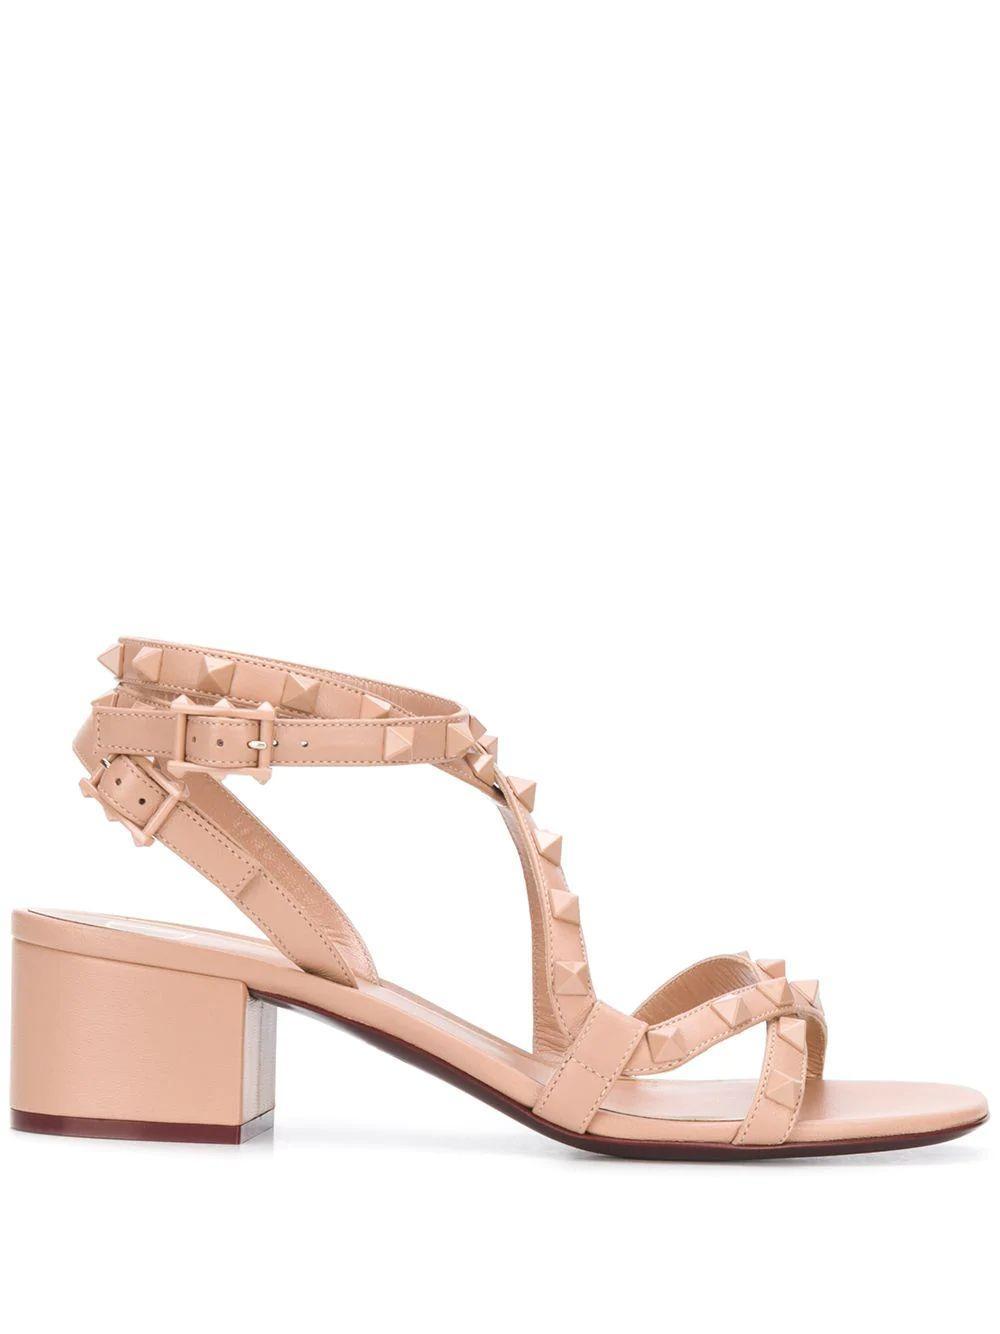 Rockstud 45mm Block Heel Sandal